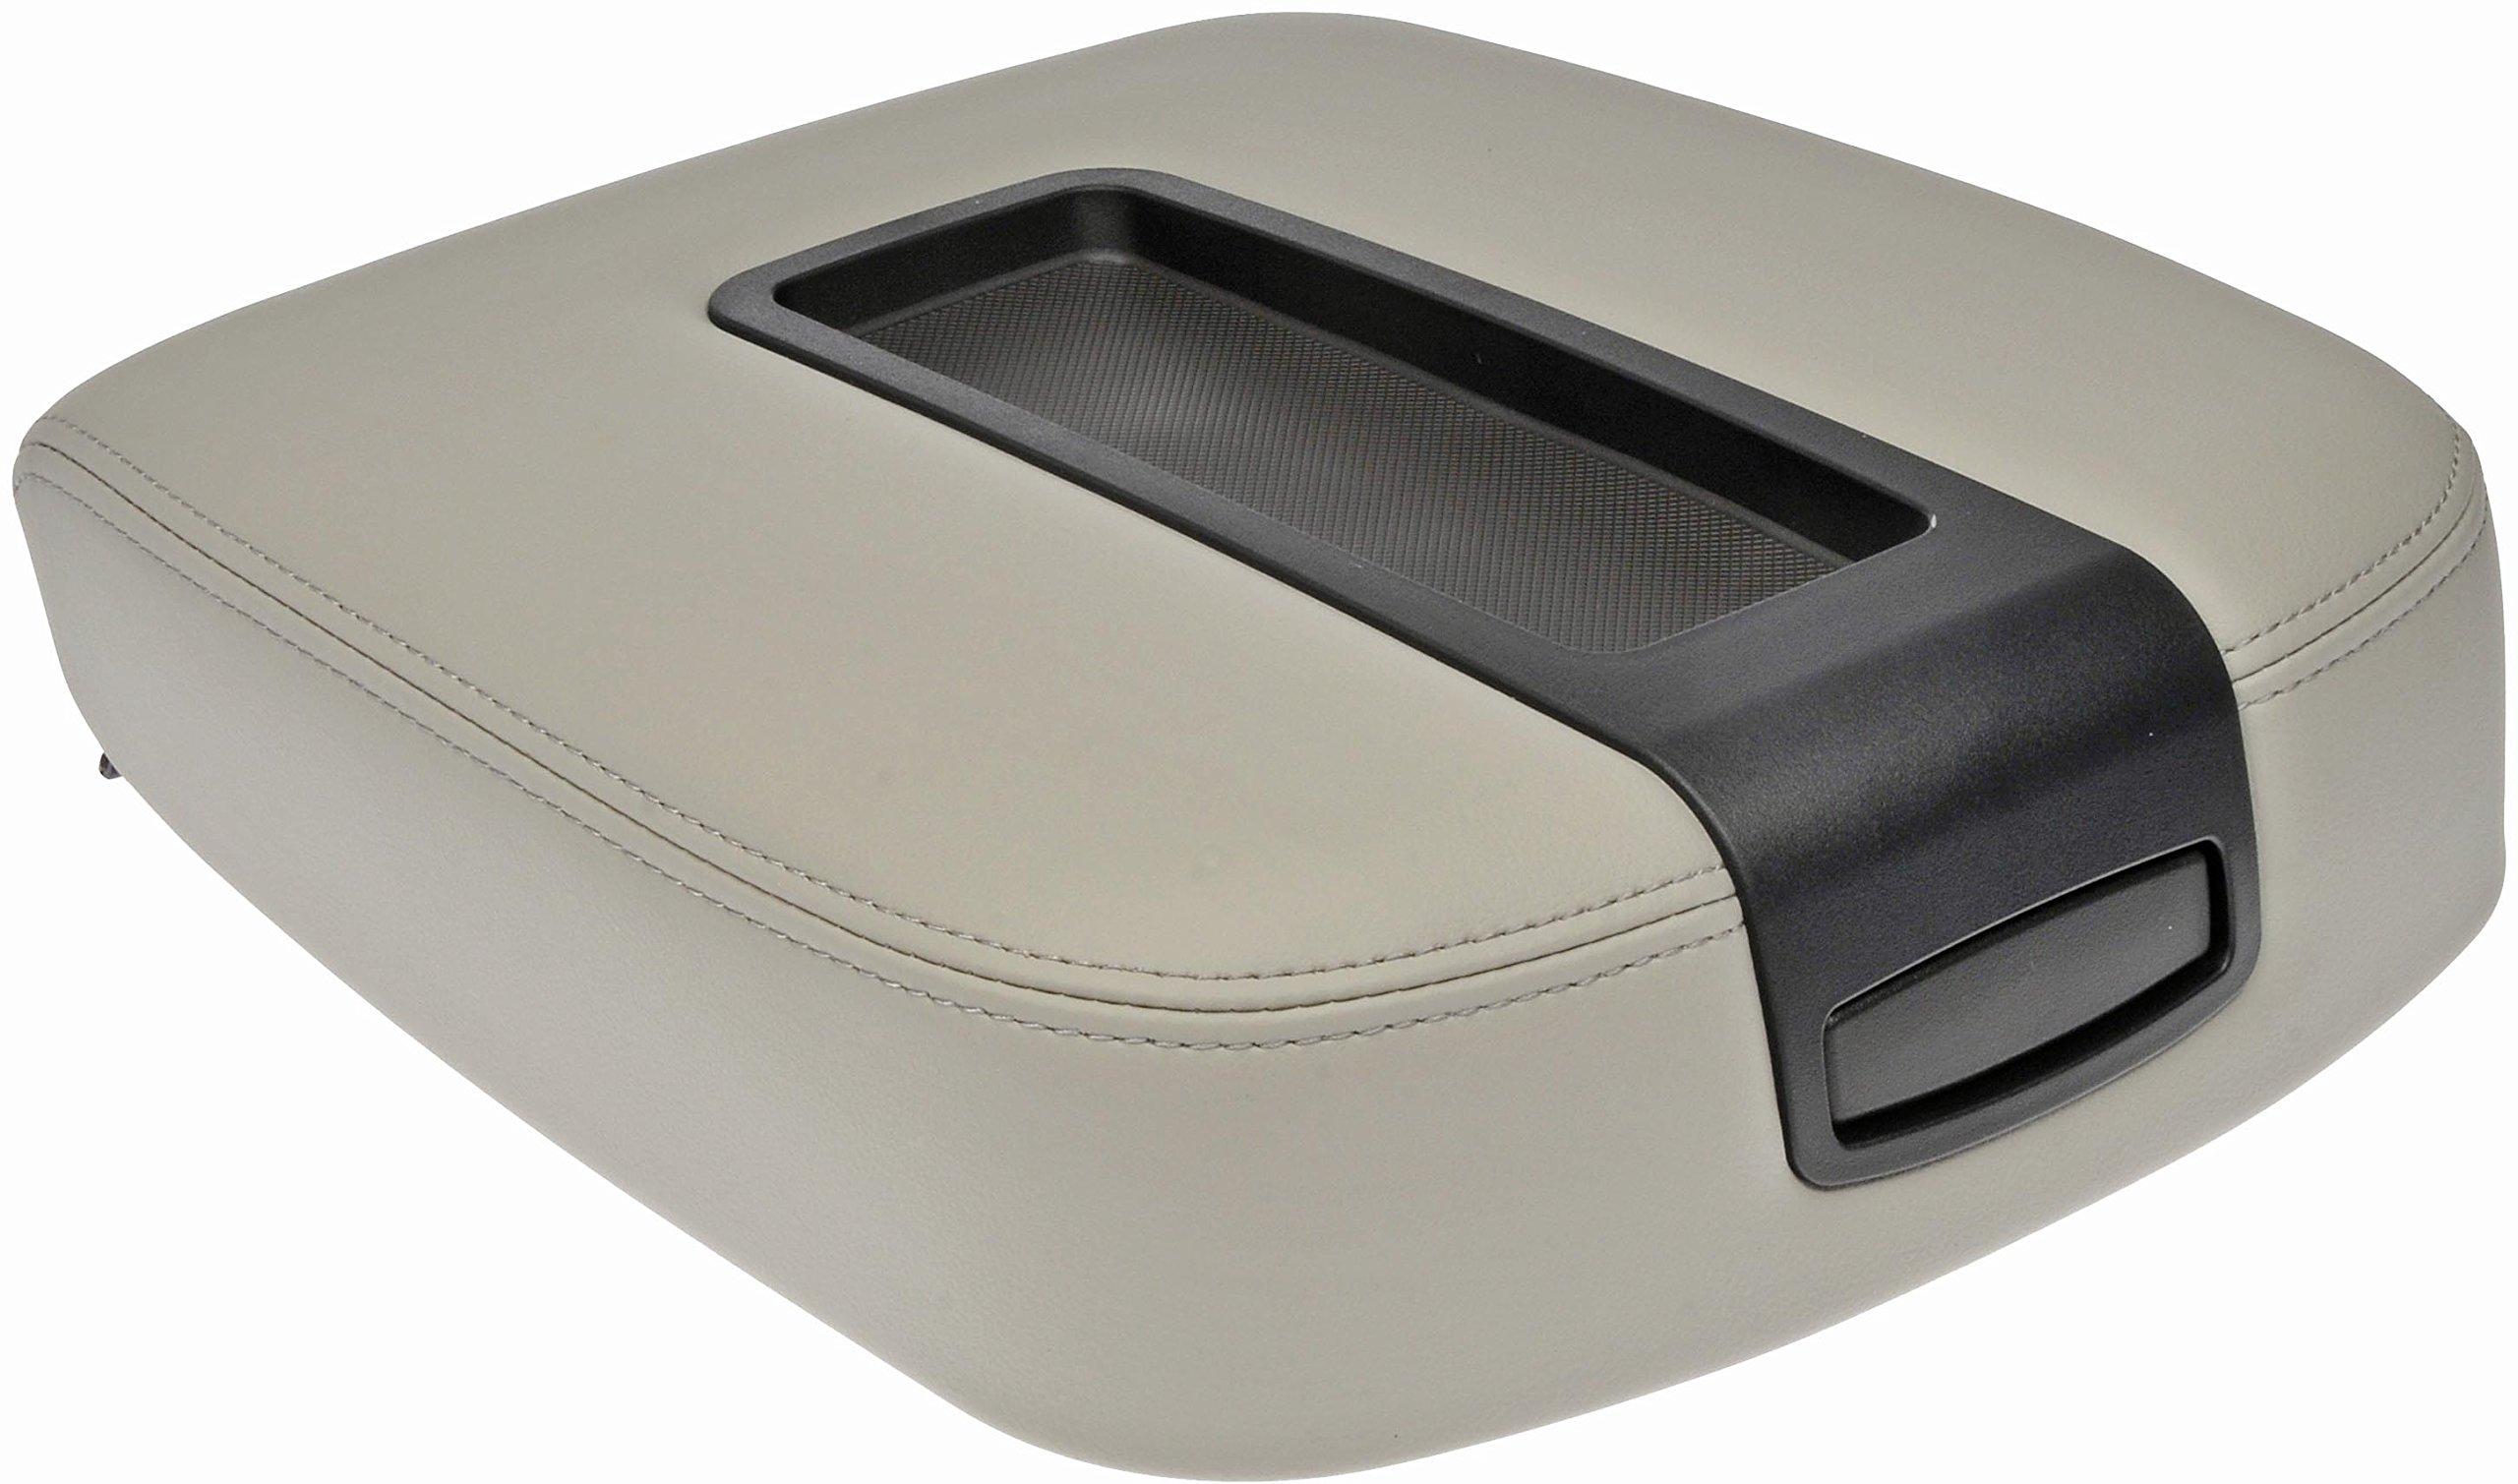 Dorman OE Solutions 924-874 Console Lid Titanium by Dorman (Image #1)